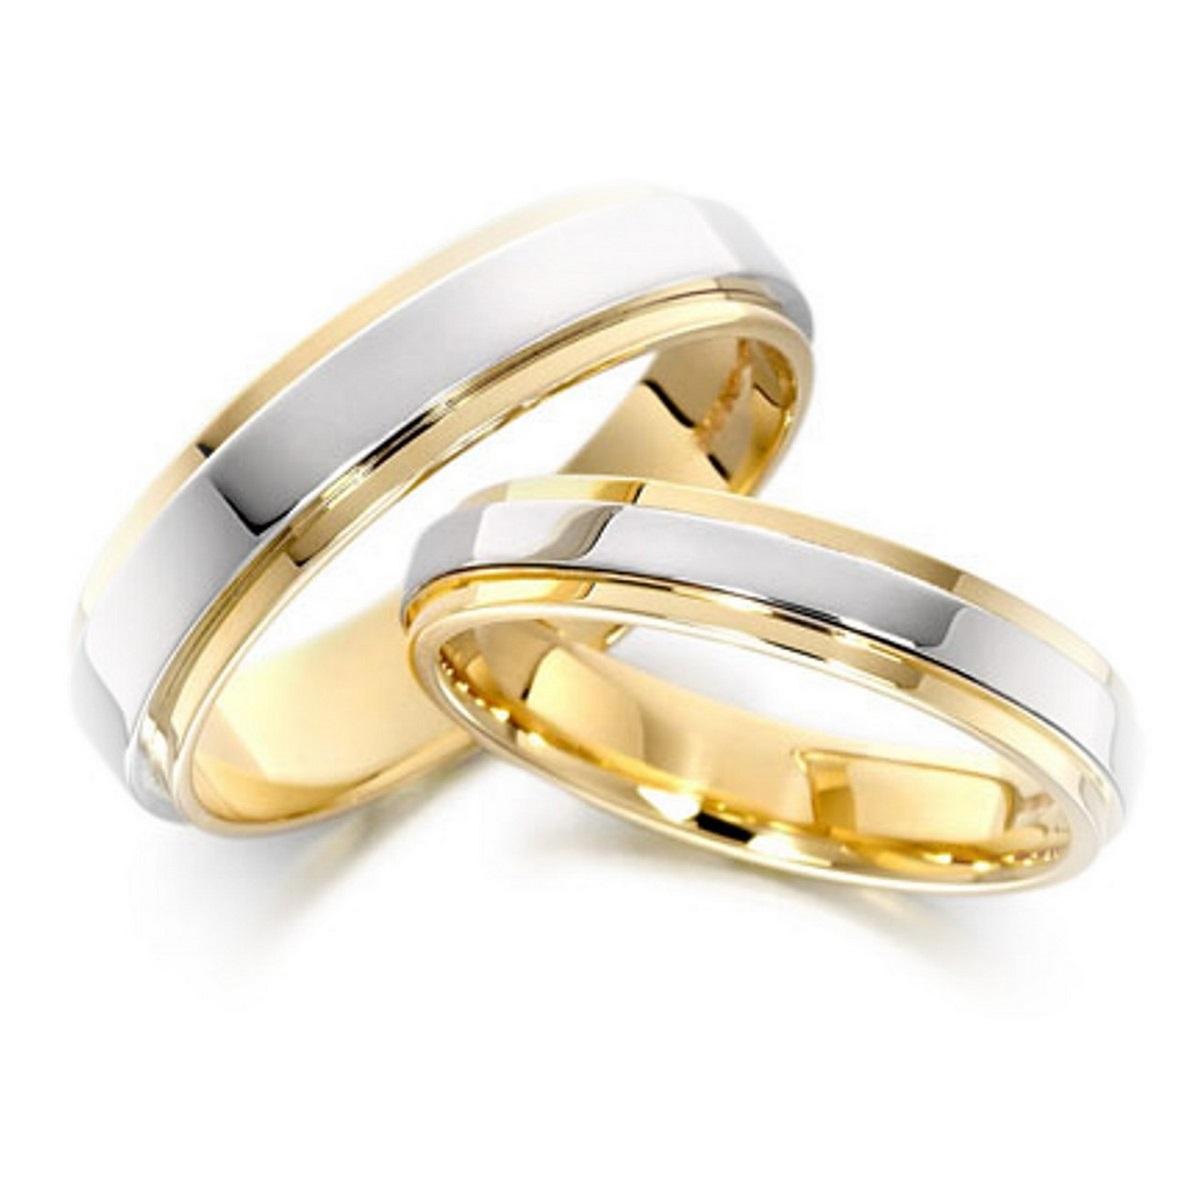 wedding gold wedding bands Matching gold wedding bands with white gold polished raised center